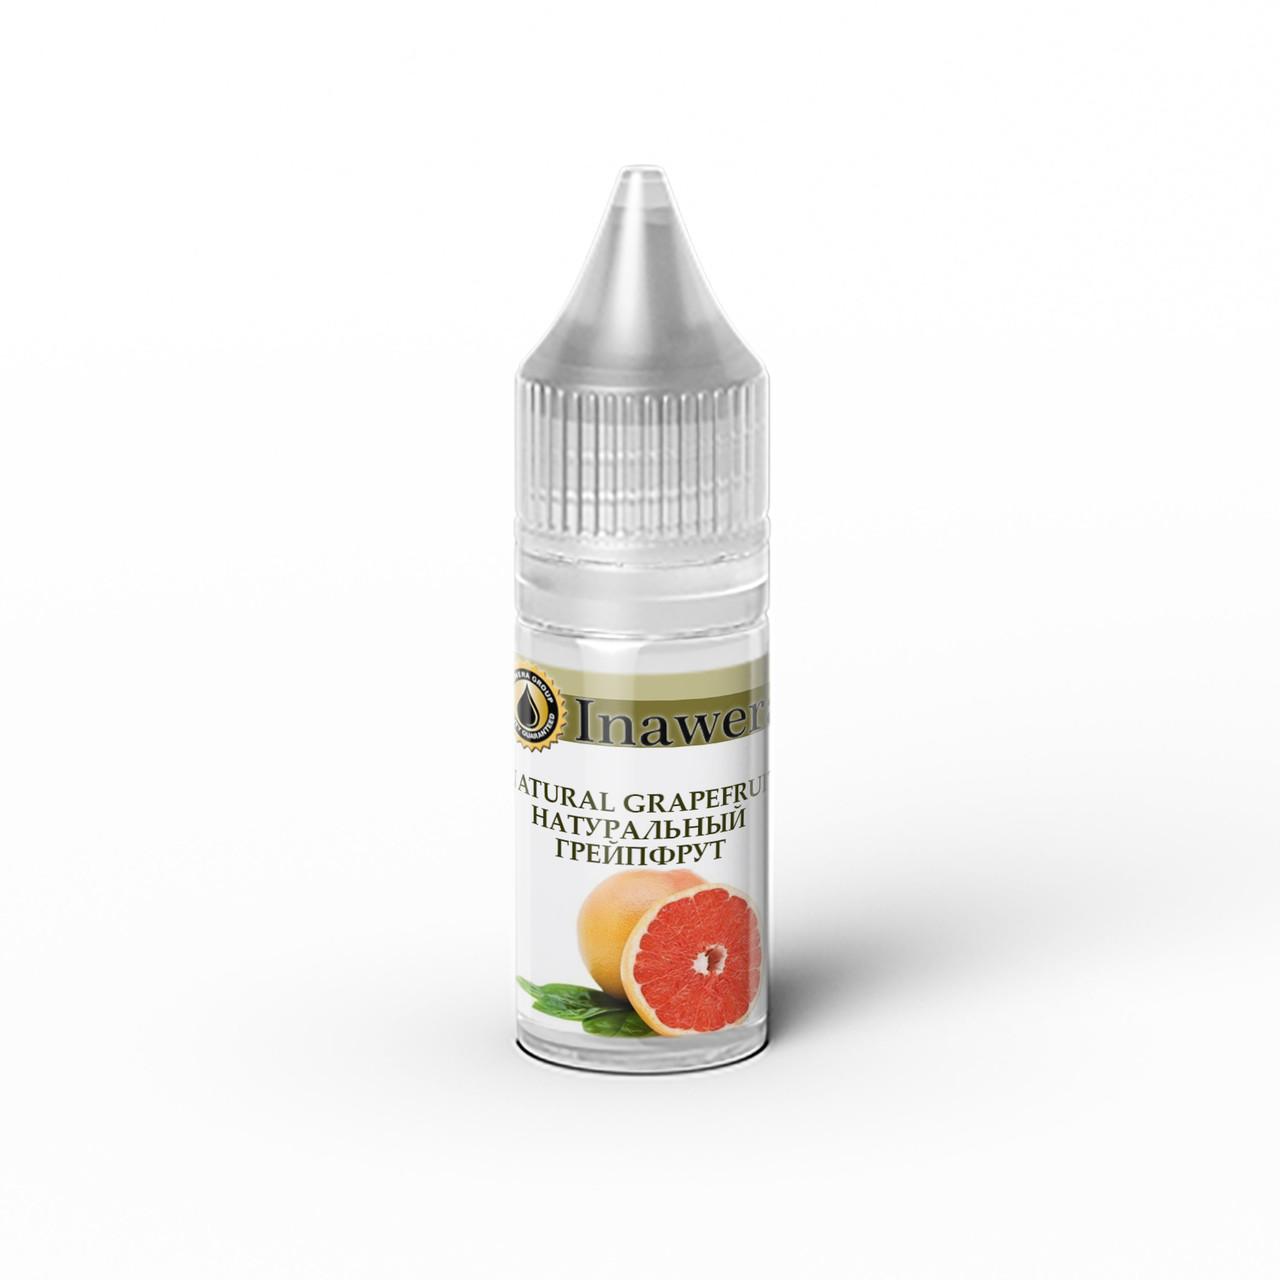 Ароматизатор Inawera Natural Grapefruit (Натуральний Грейпфрут)